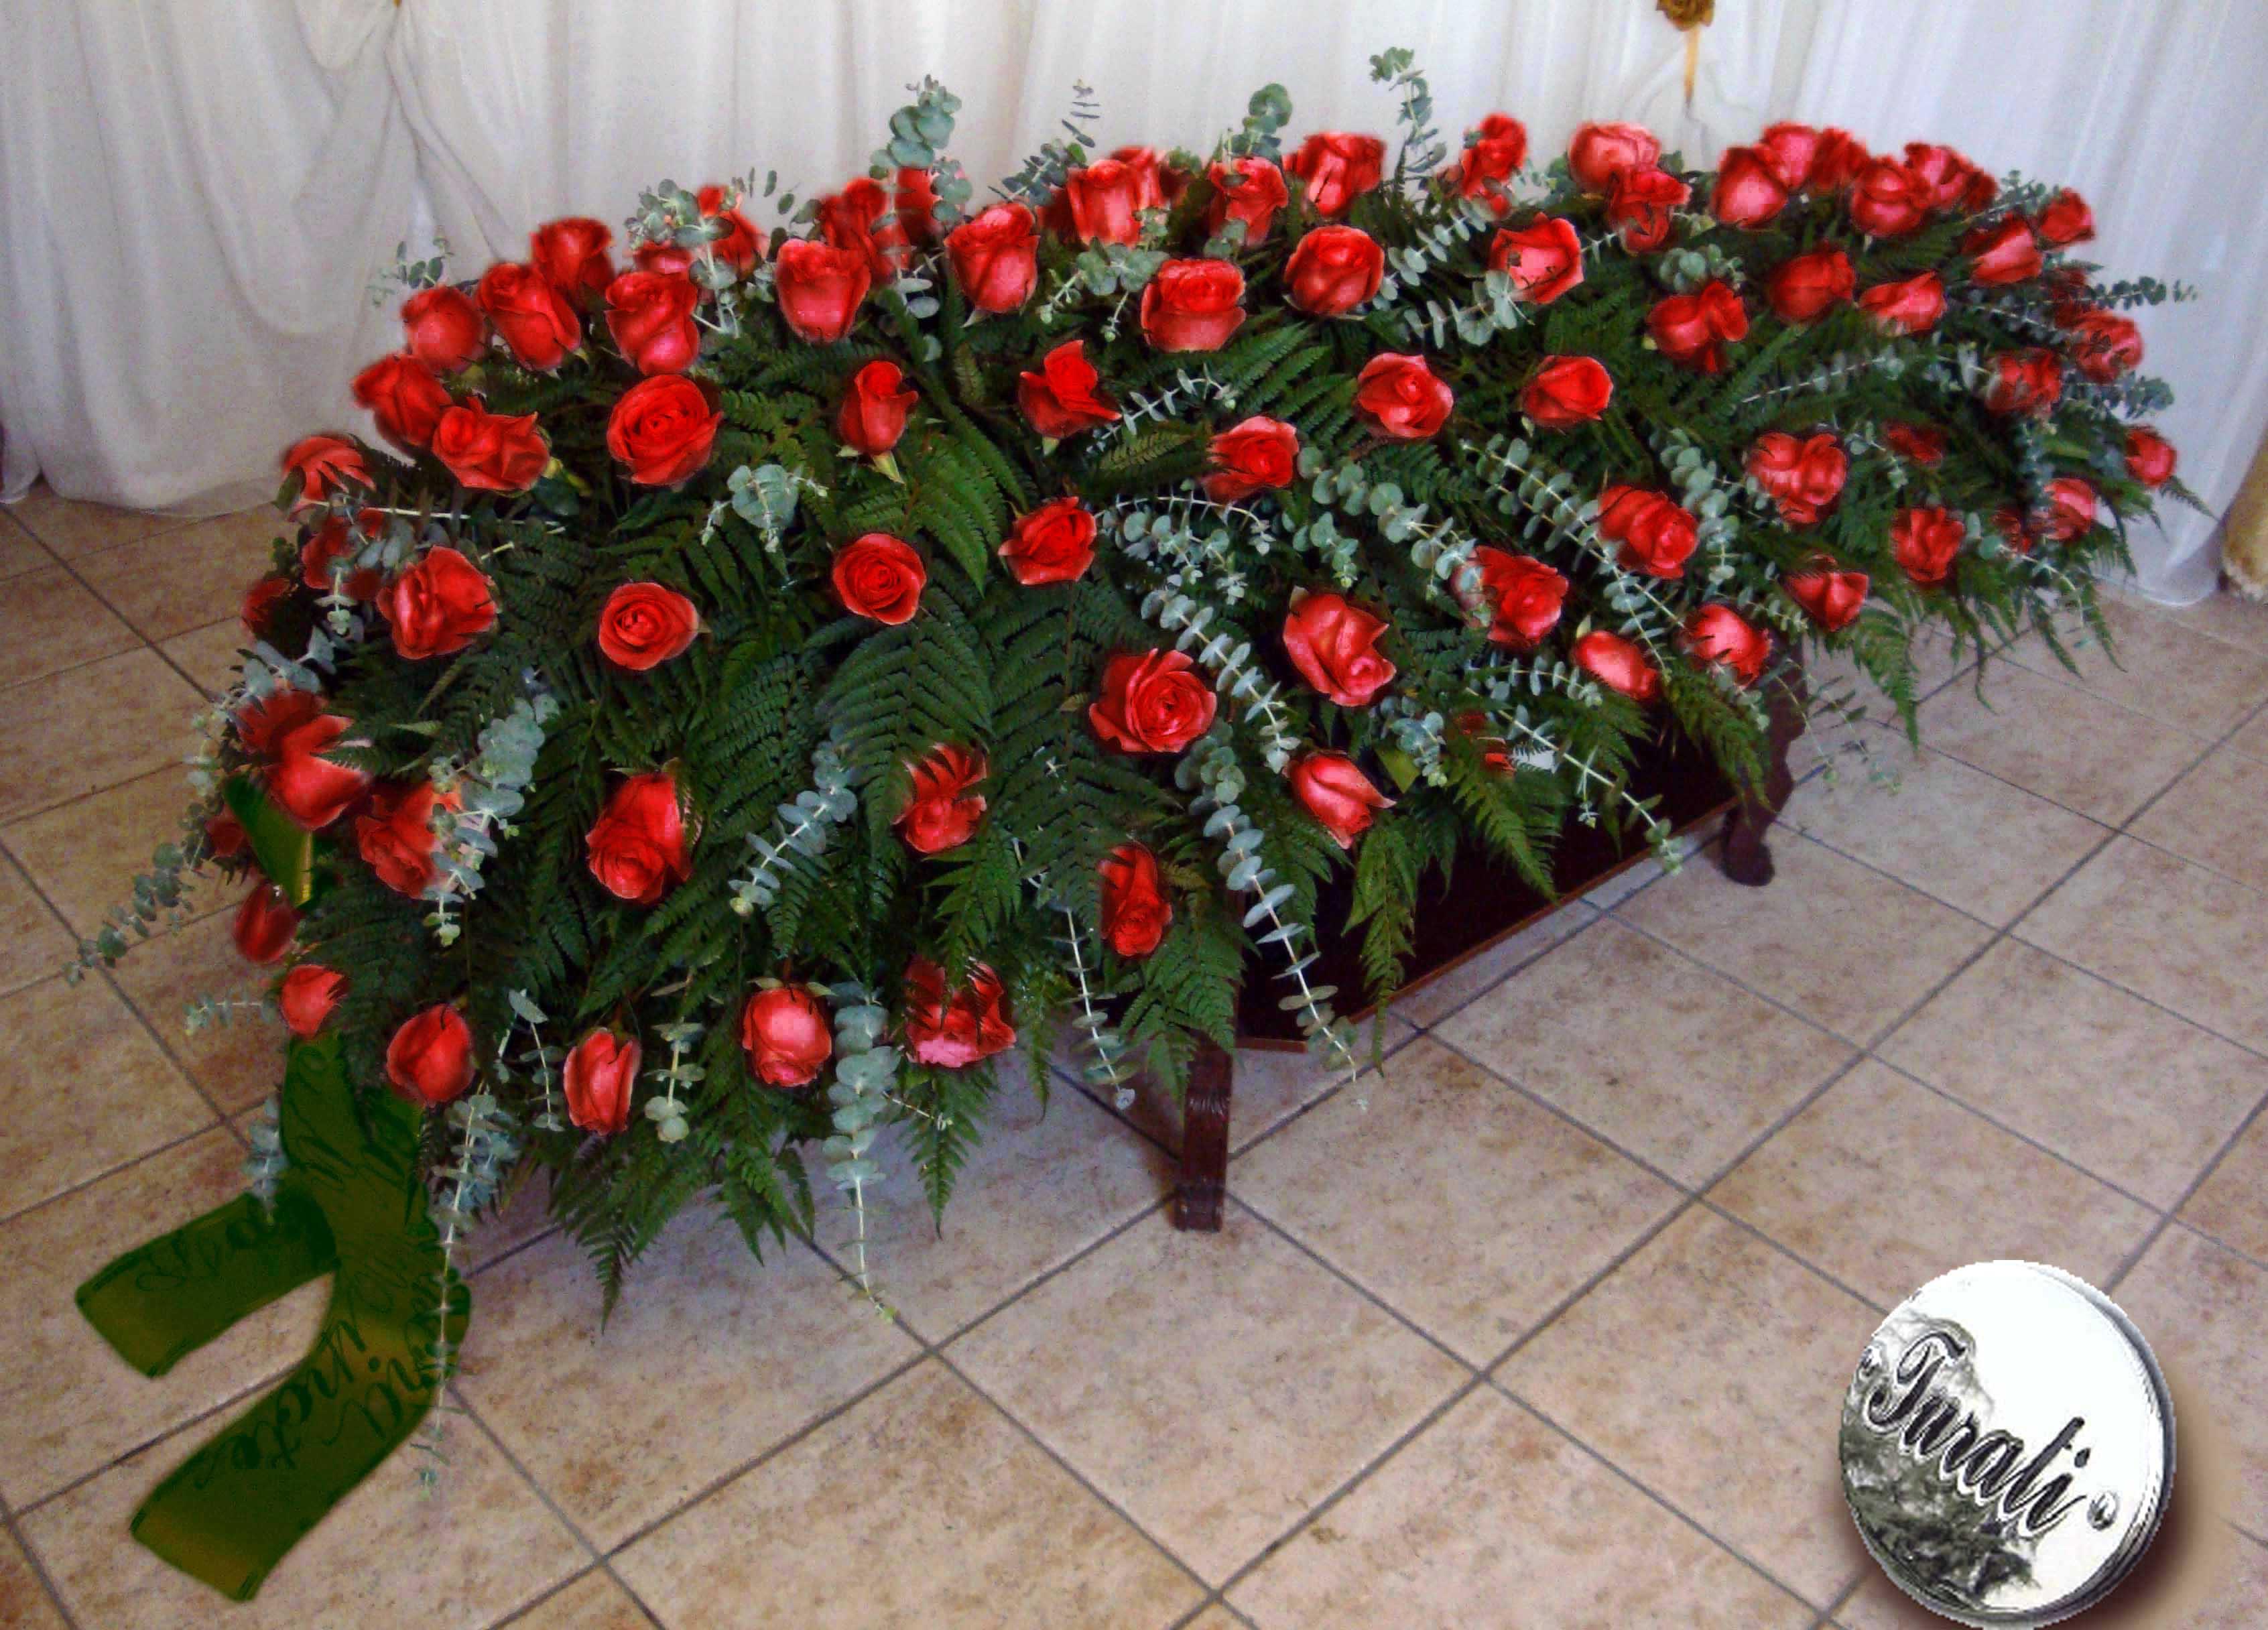 cofano rose rosse